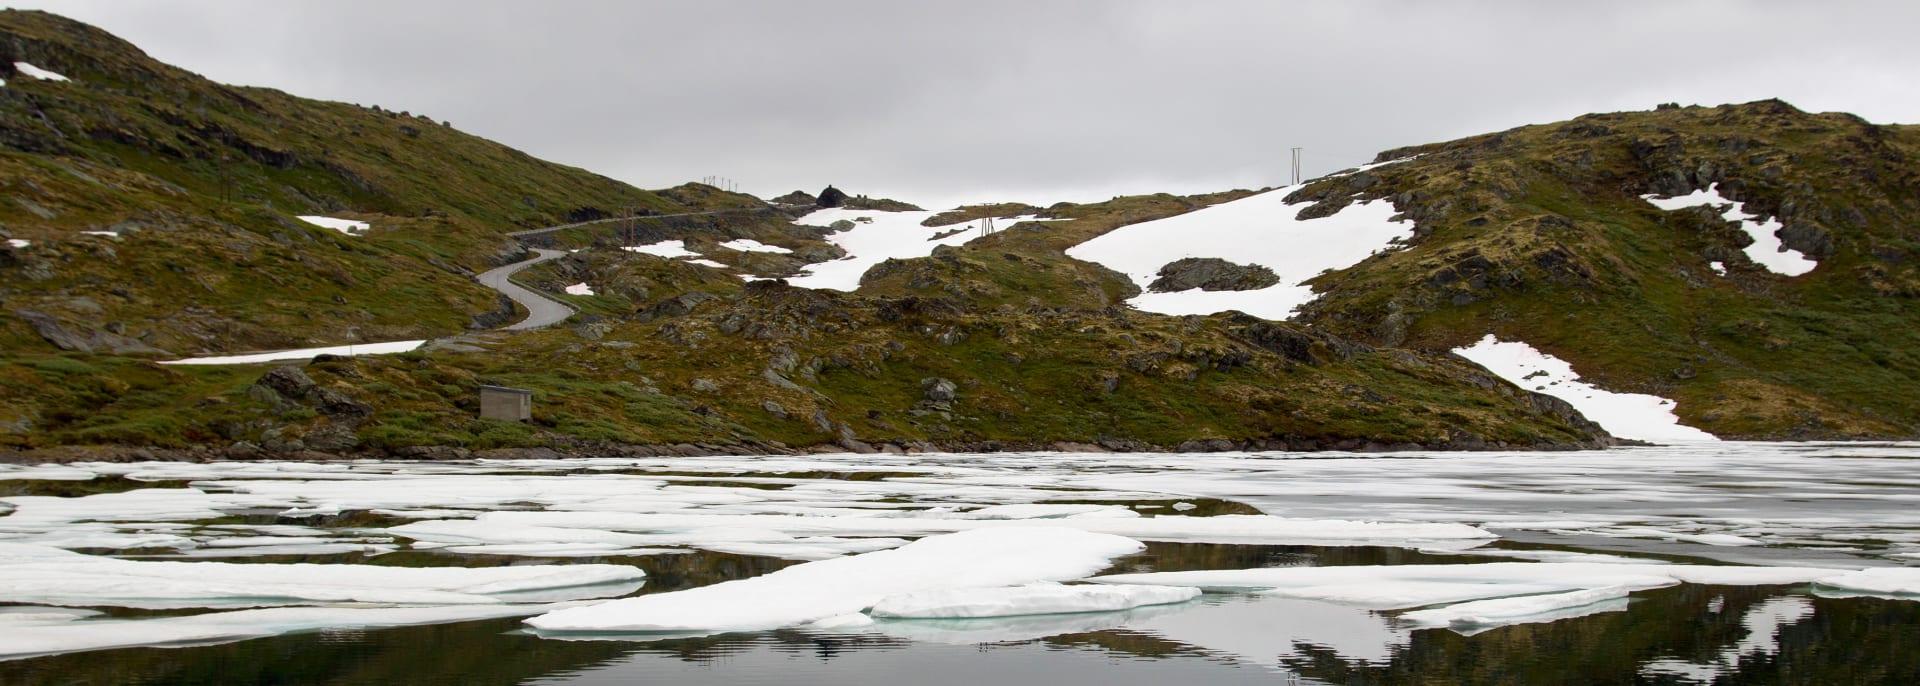 Valldal, Norwegen